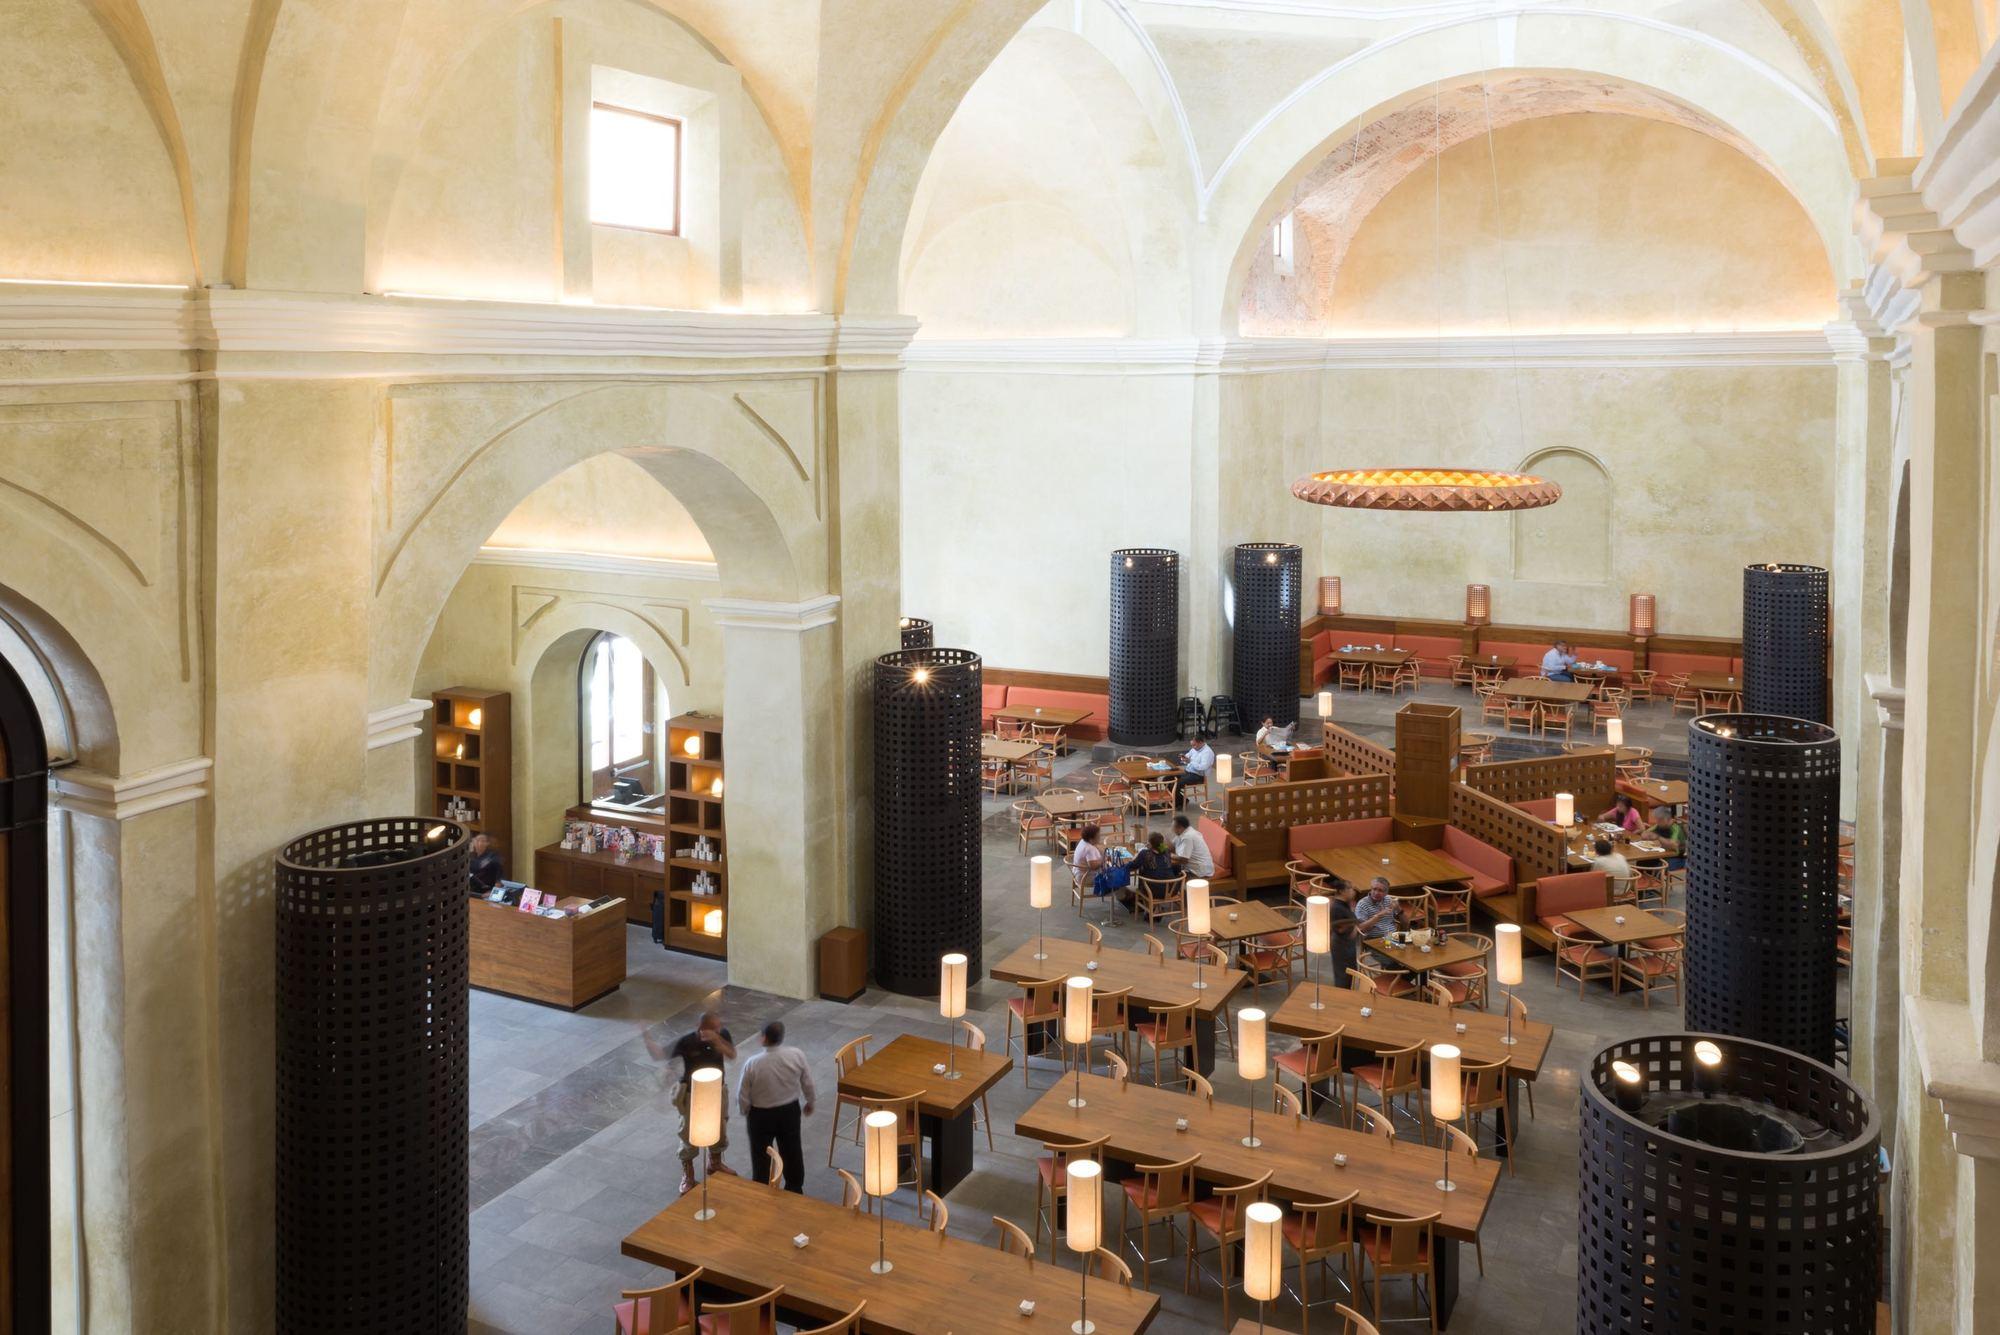 Restaurante Toks Veracruz Legorreta Archdaily M 233 Xico